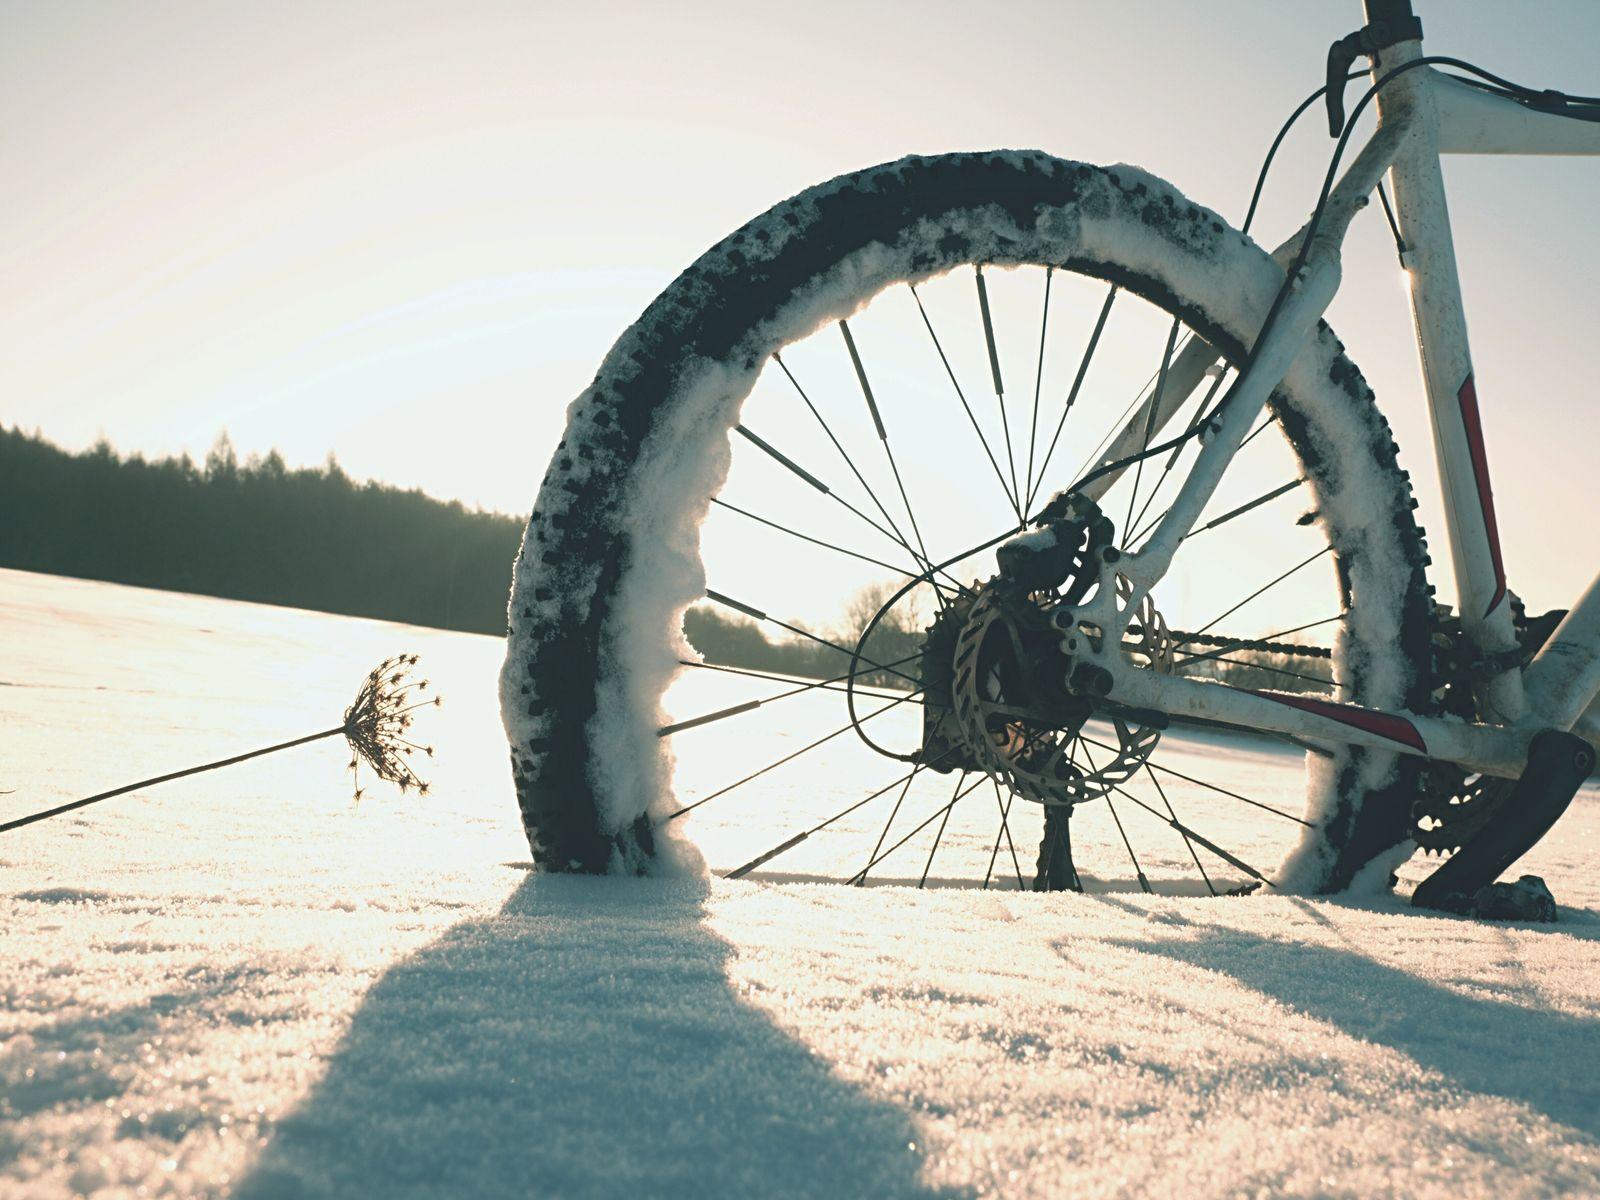 Mountain bike stay in powder snow. Lost path in deep snowdrift. Rear wheel detail. Snow flakes melting on dark off road tyre. Winter weather in the field. (rdonar)